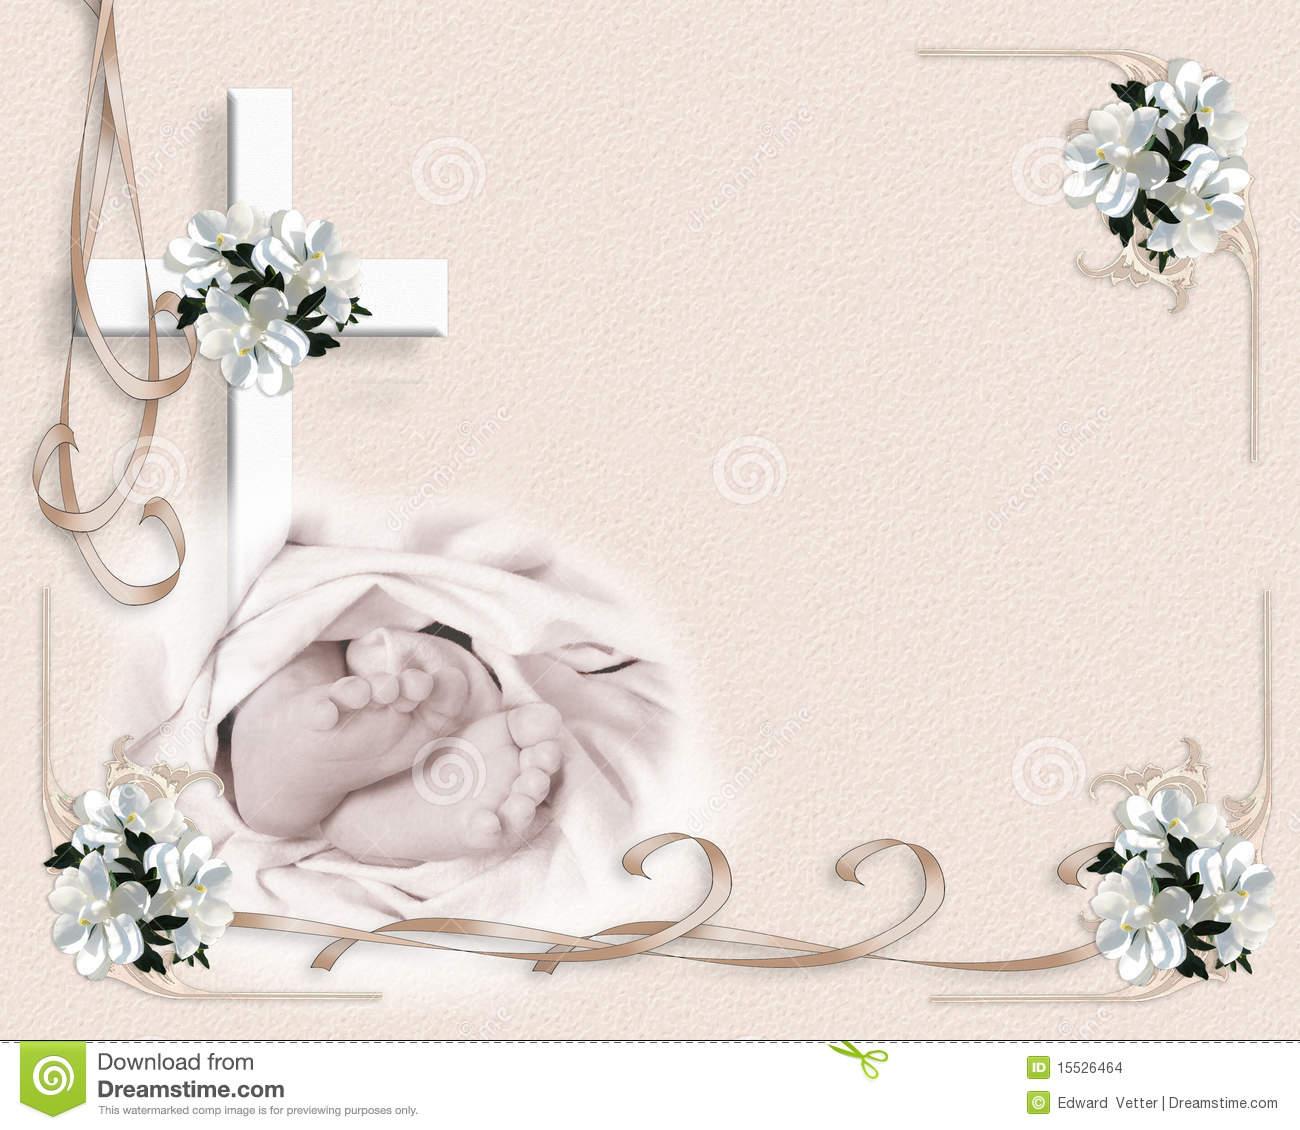 Invitation Card Samples For Christening. baptismal invitation template free download  Endo re enhance